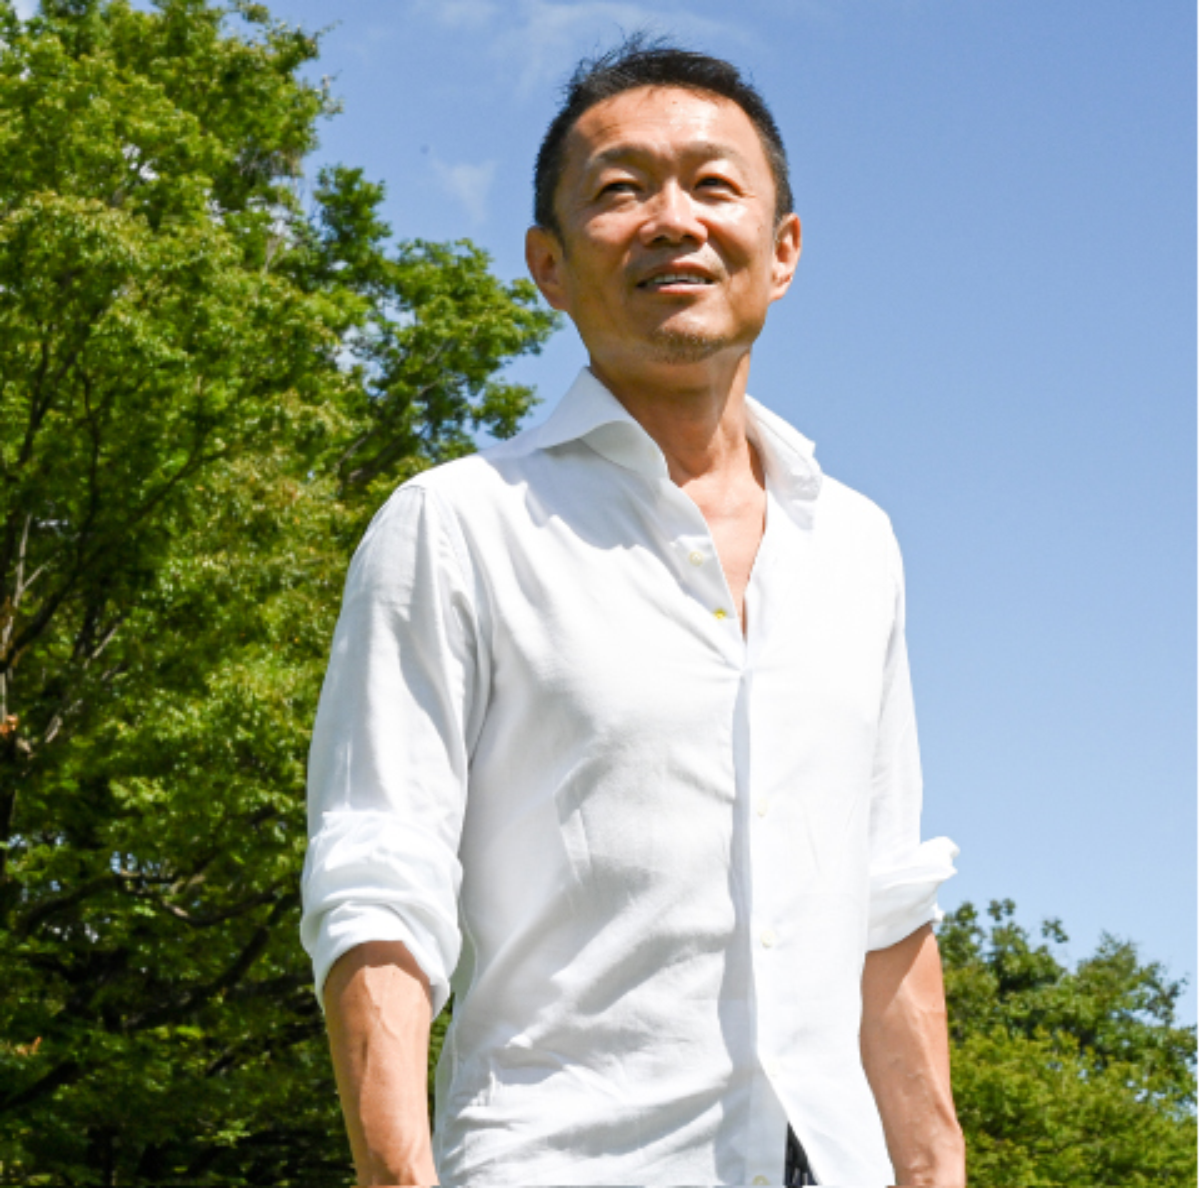 Hiroyuki Atarashi